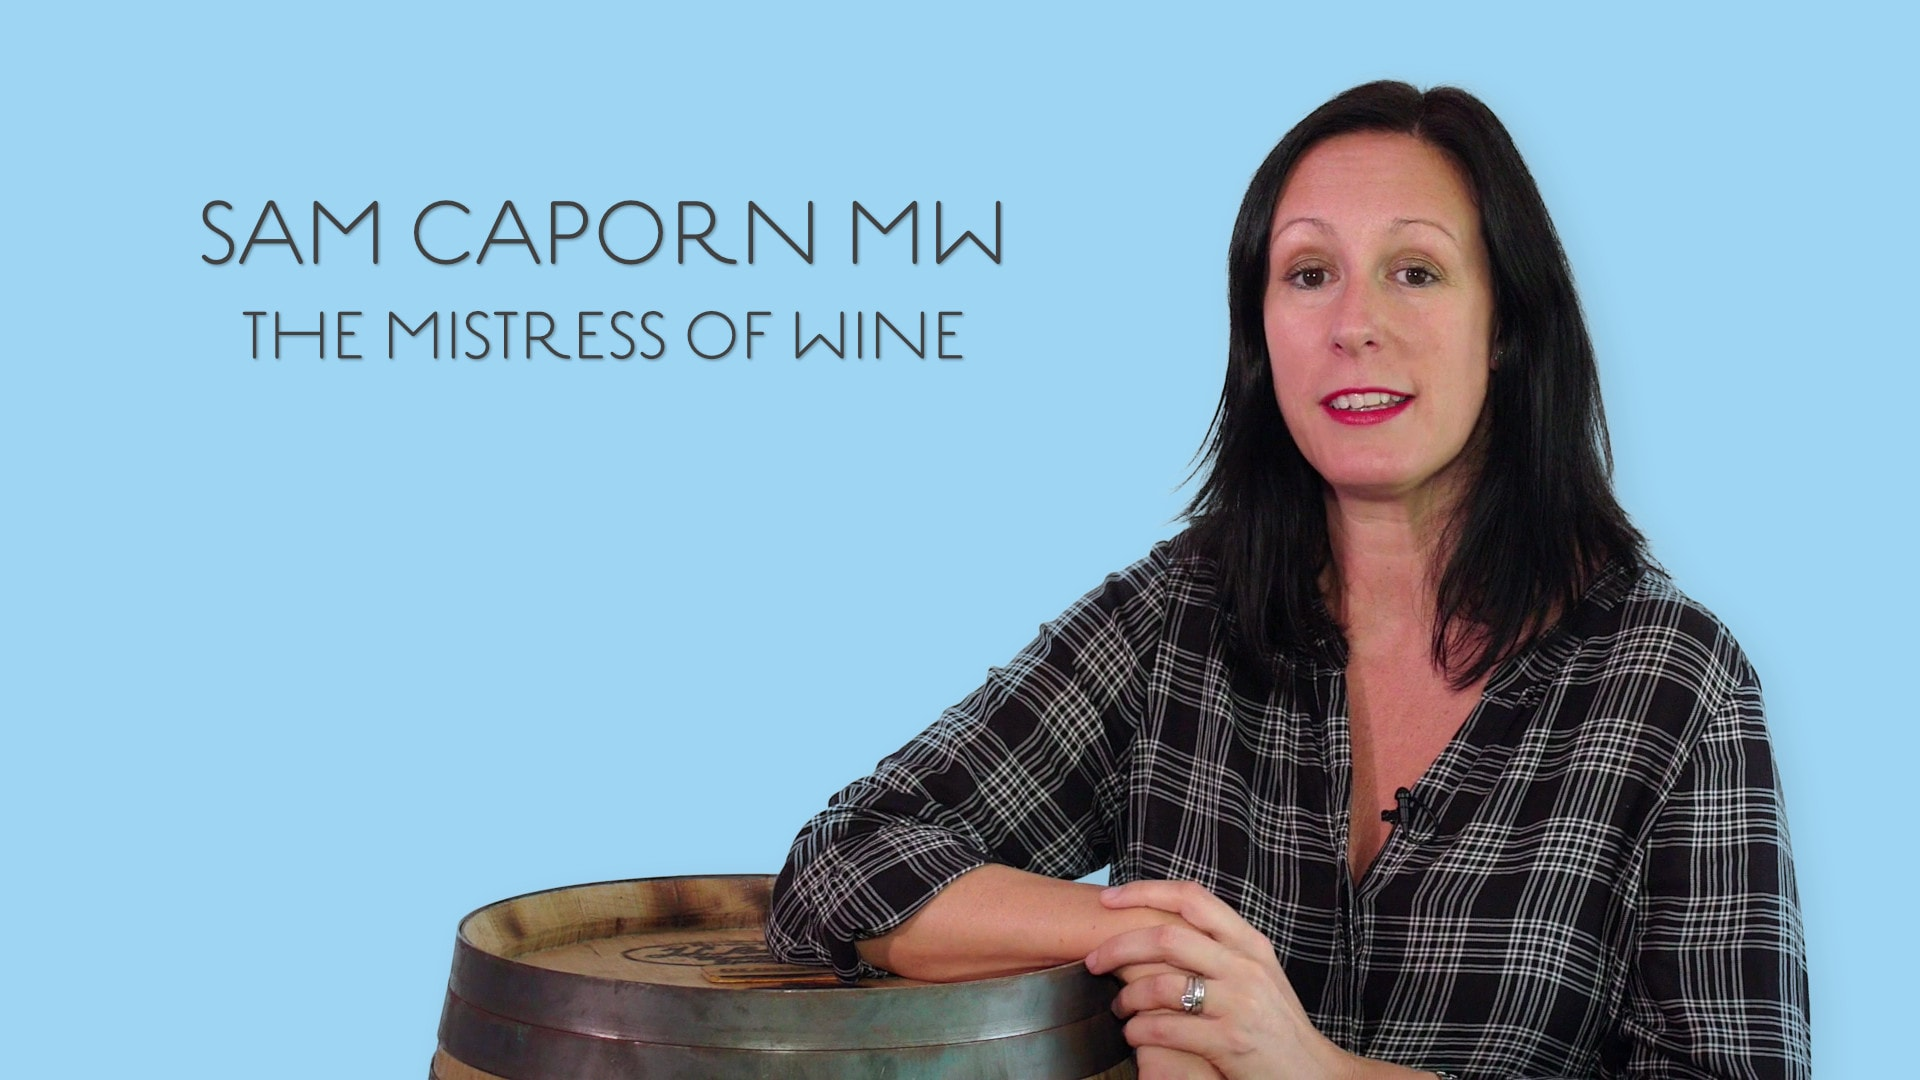 The Mistress of Wine